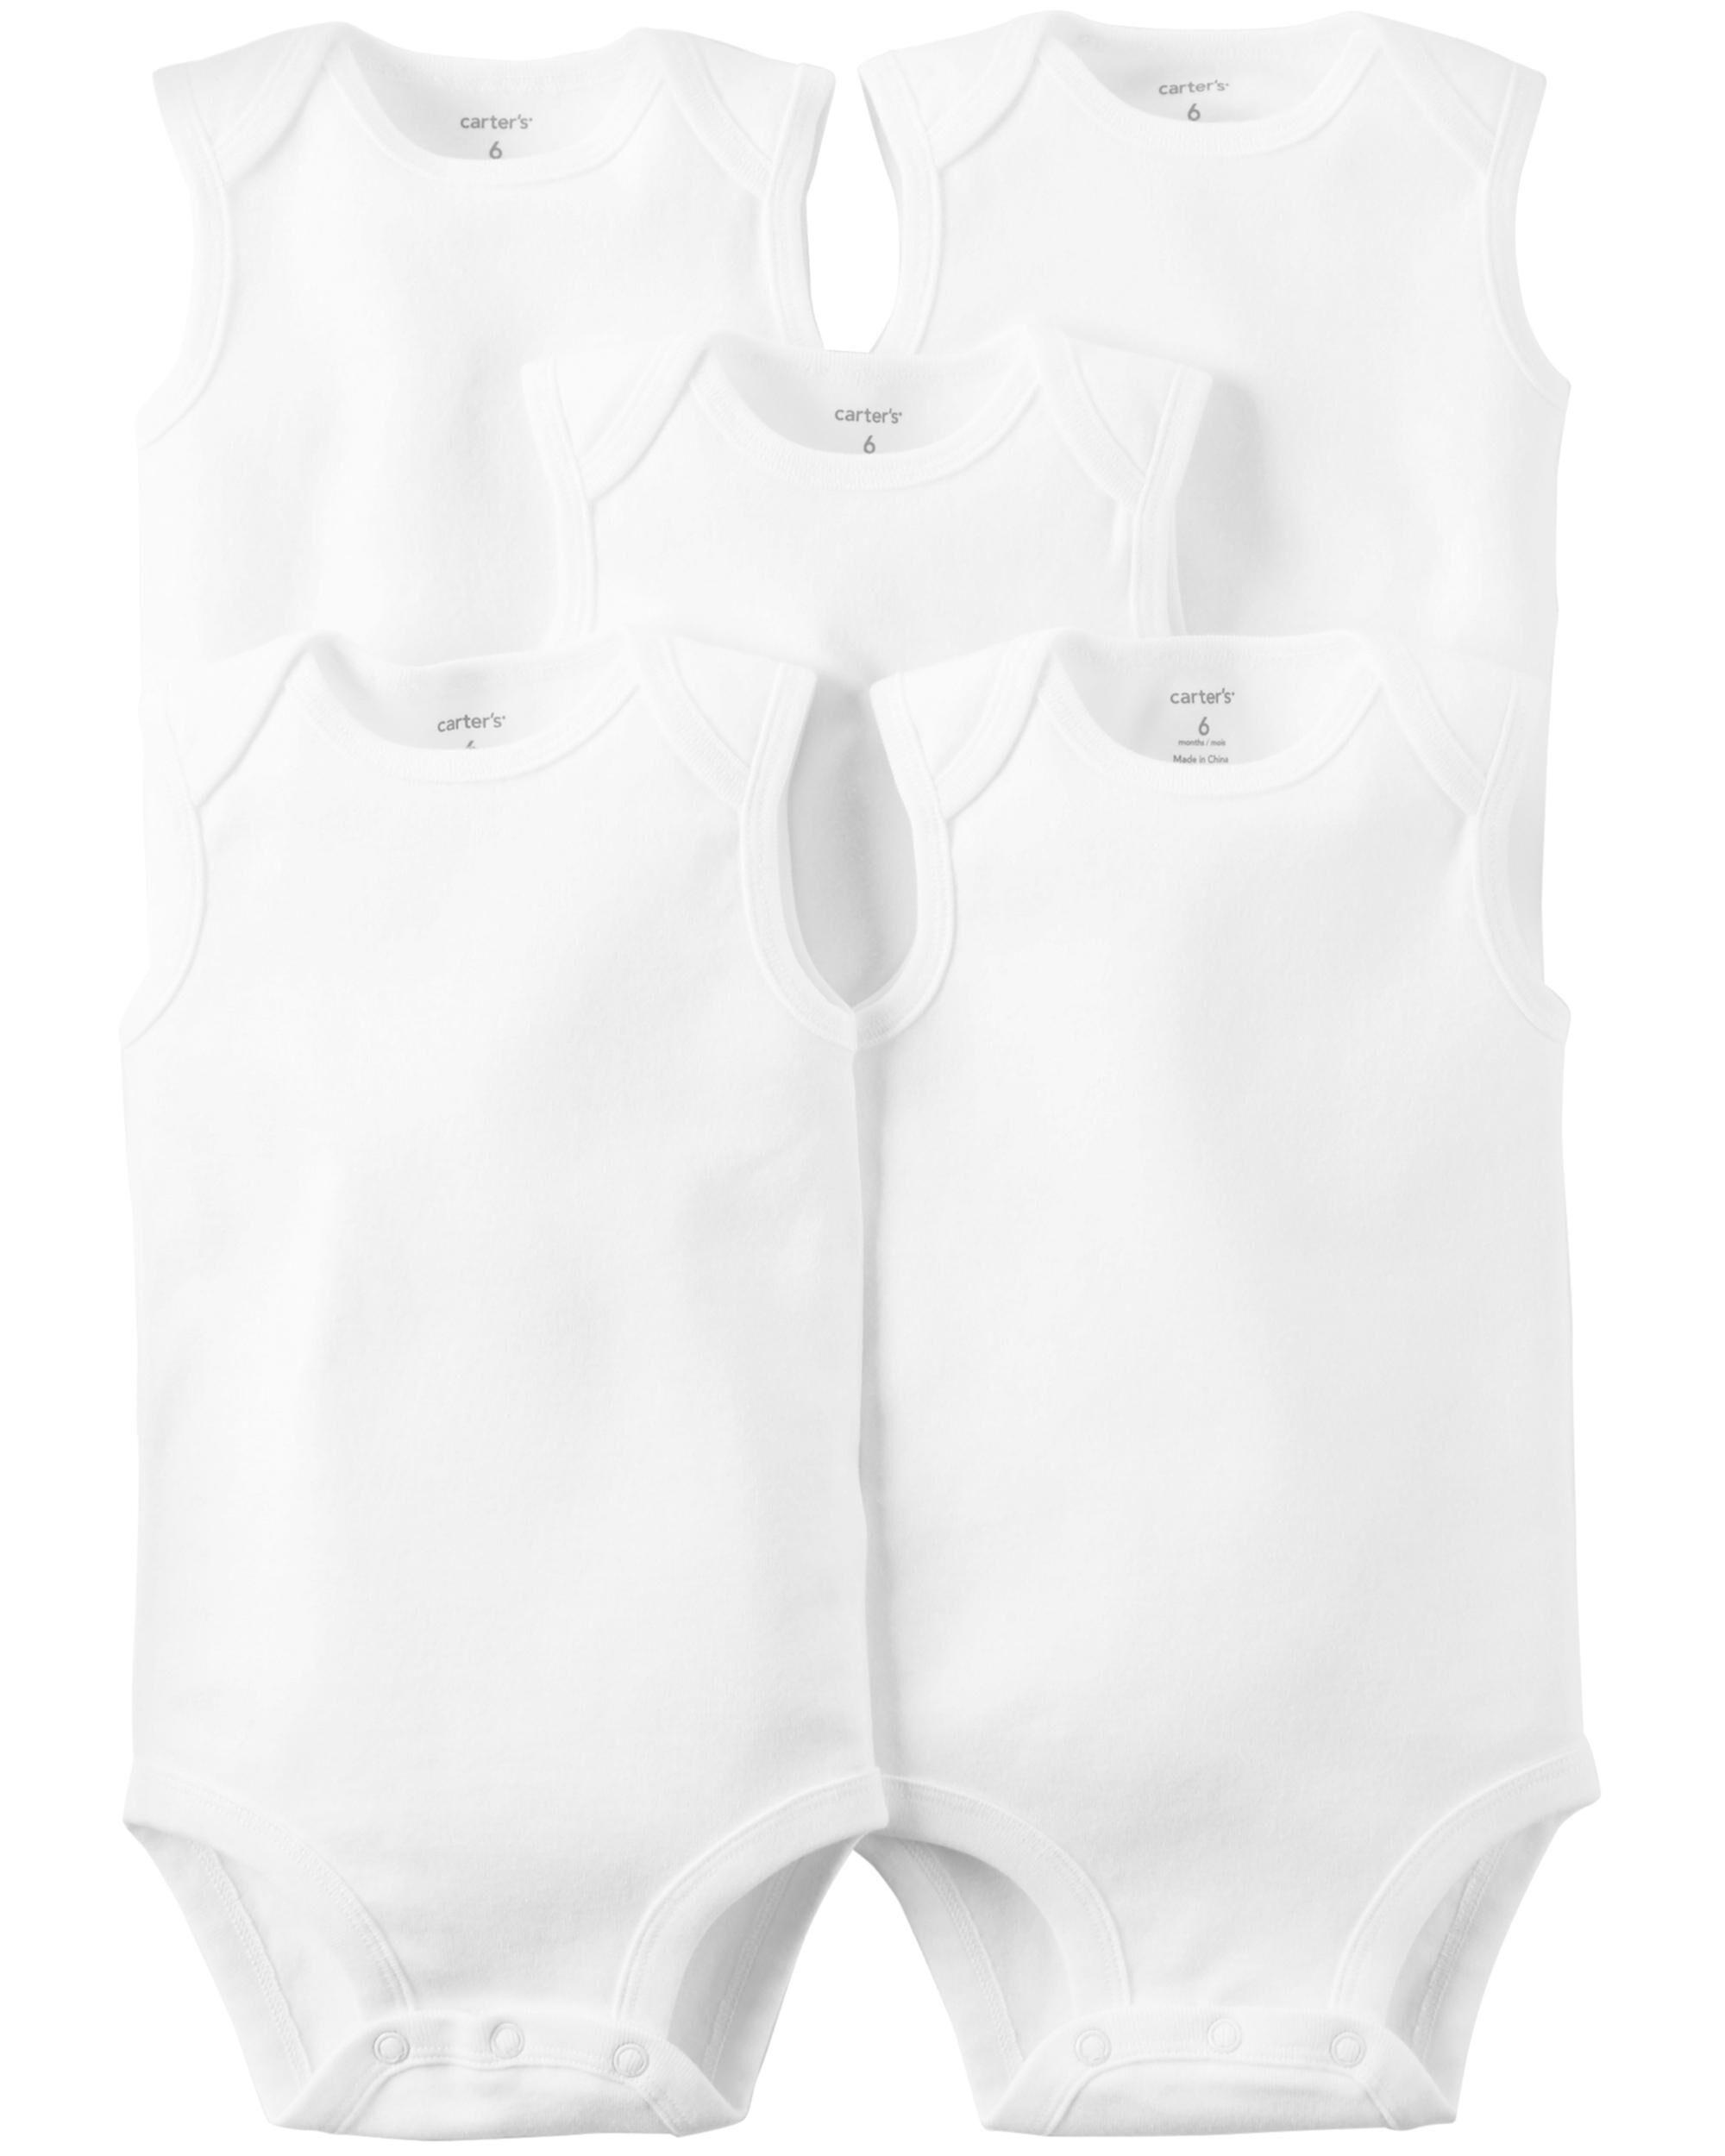 *DOORBUSTER* 5-Pack Sleeveless Original Bodysuits